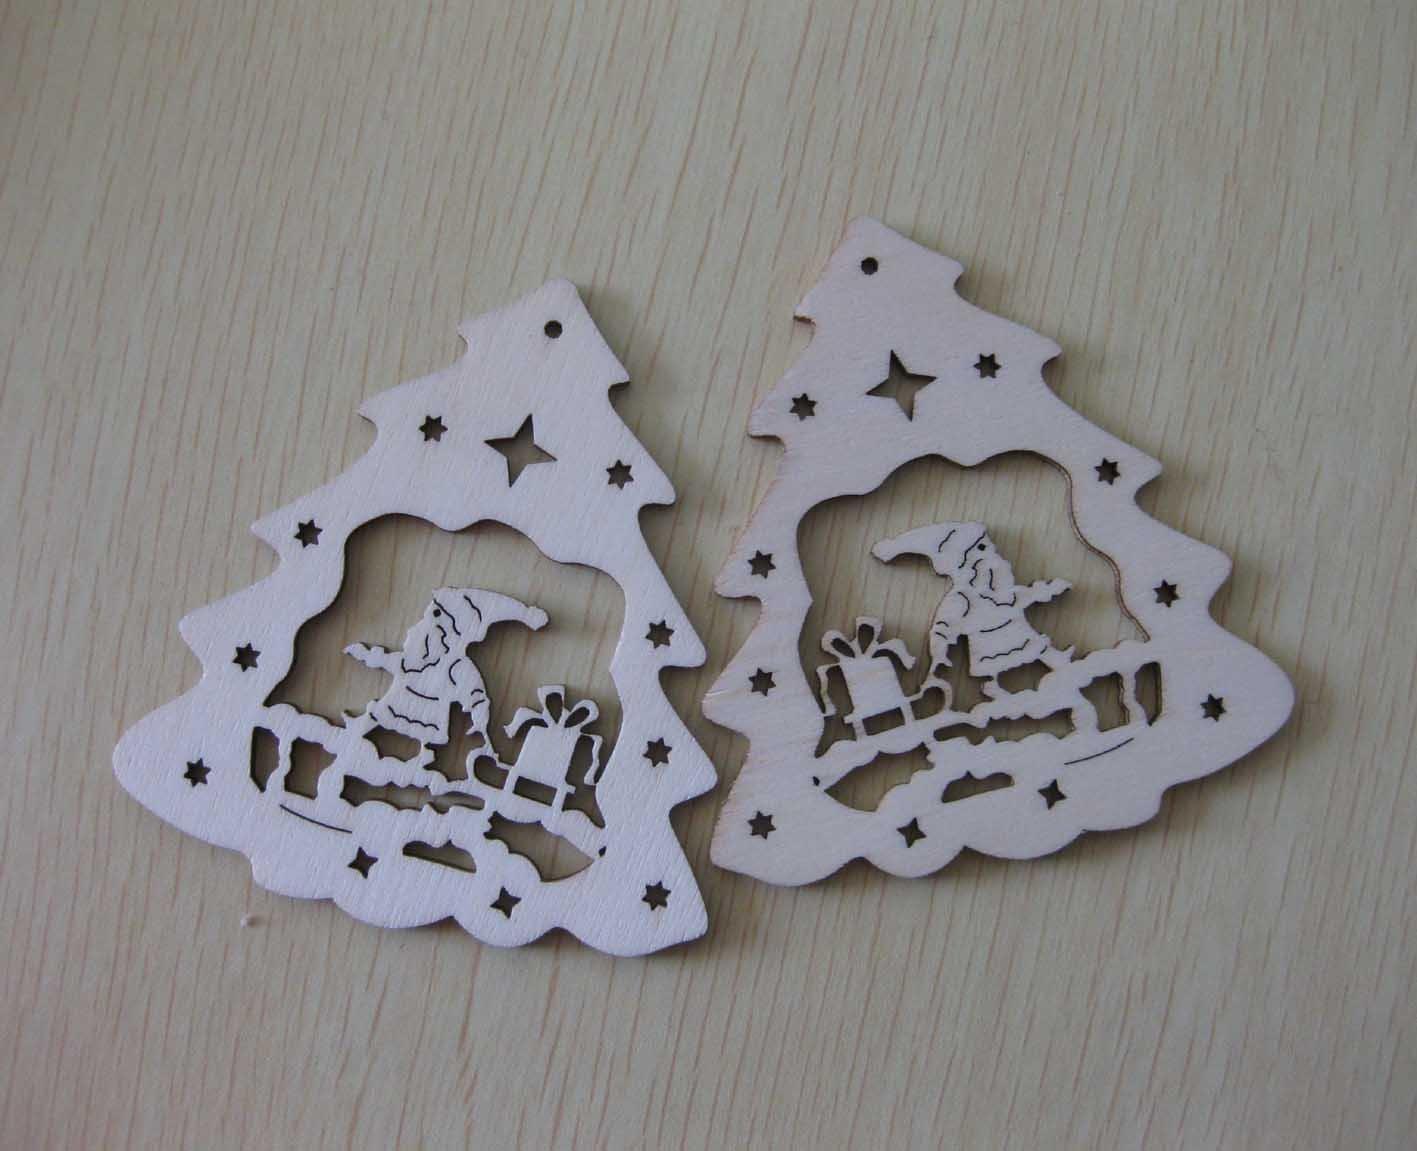 #535A78 2013 Hot Selling Laser Cut Christmas Haging Decoration  6437 décoration noel laser 1417x1151 px @ aertt.com